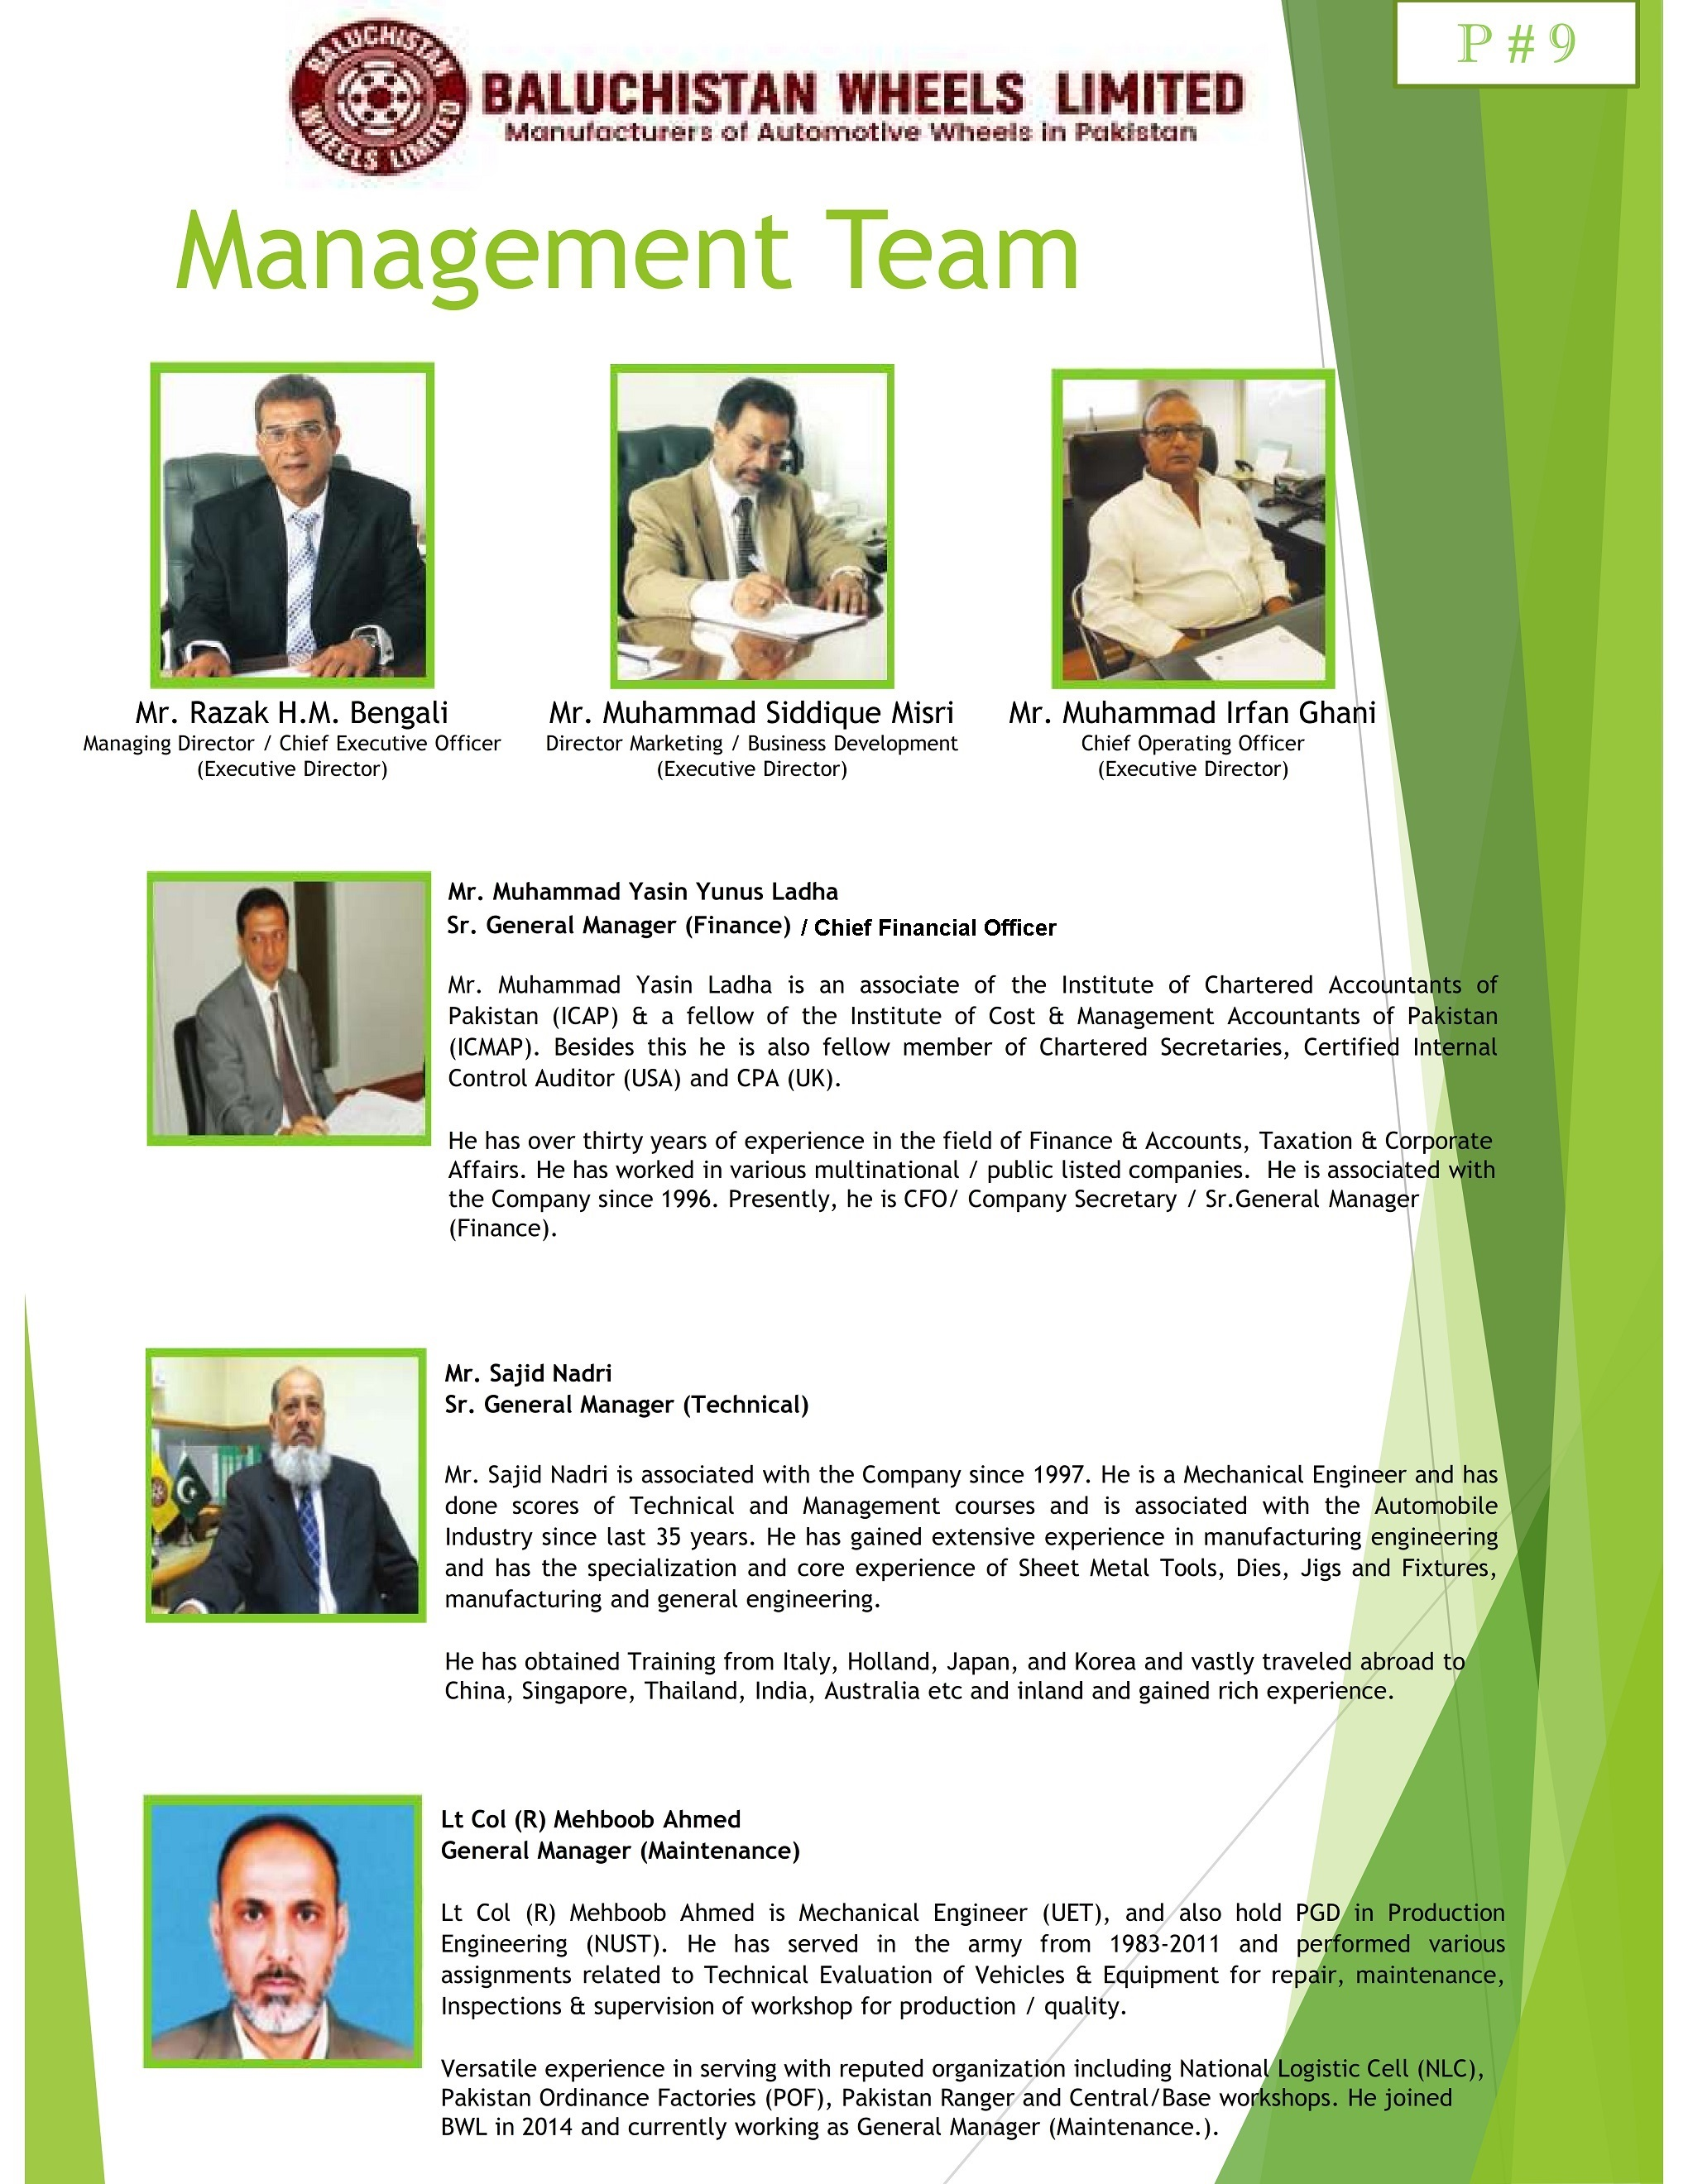 Management Team – Baluchistan Wheels Limited